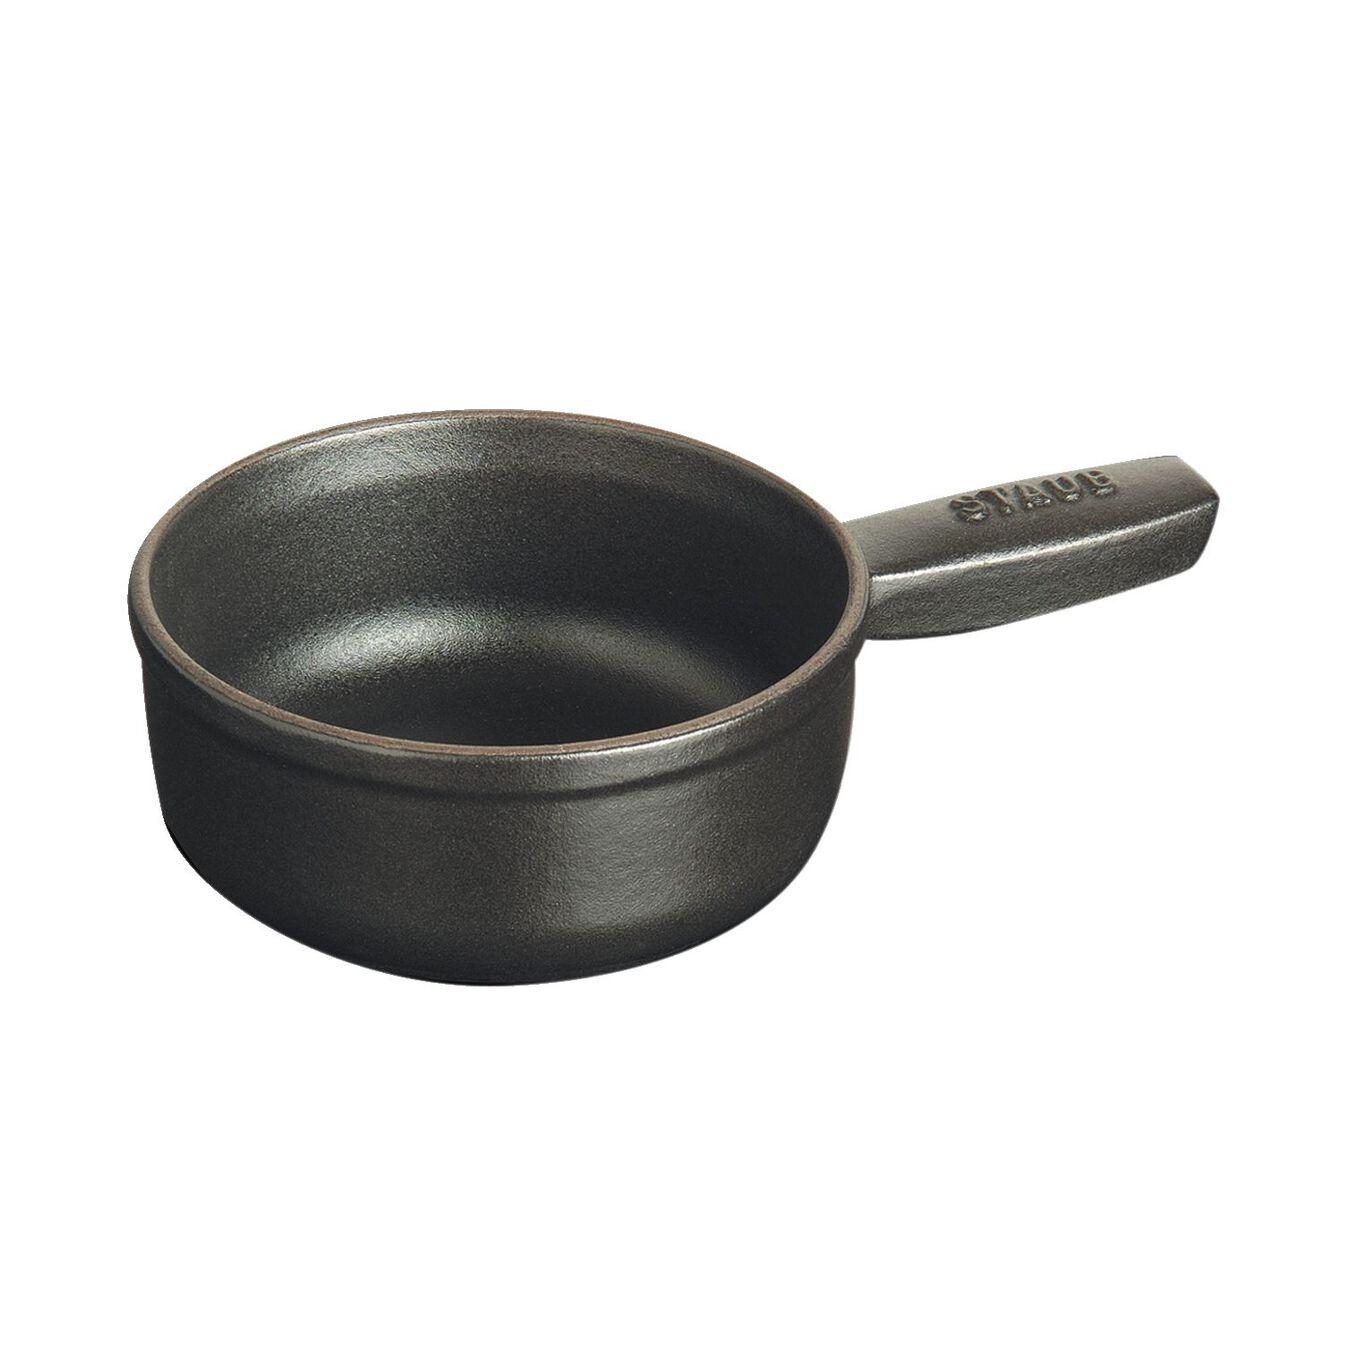 Panela para fondue 12 cm, Preto,,large 3